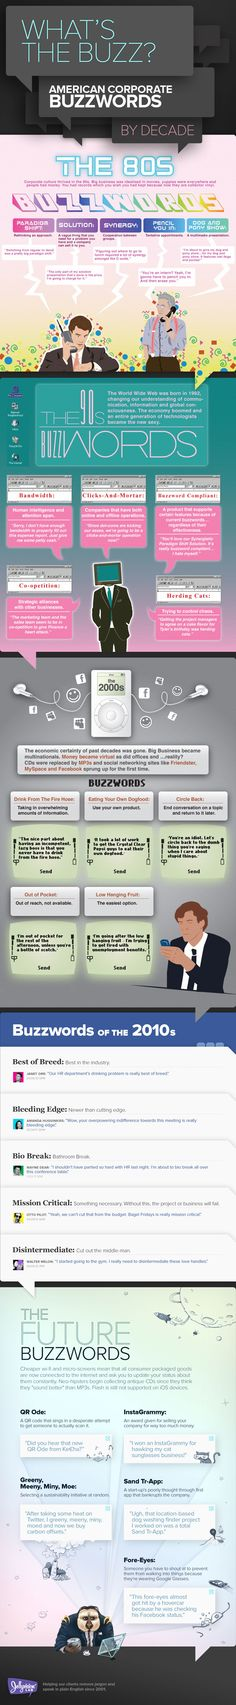 American Corporate Buzzwords By Decades